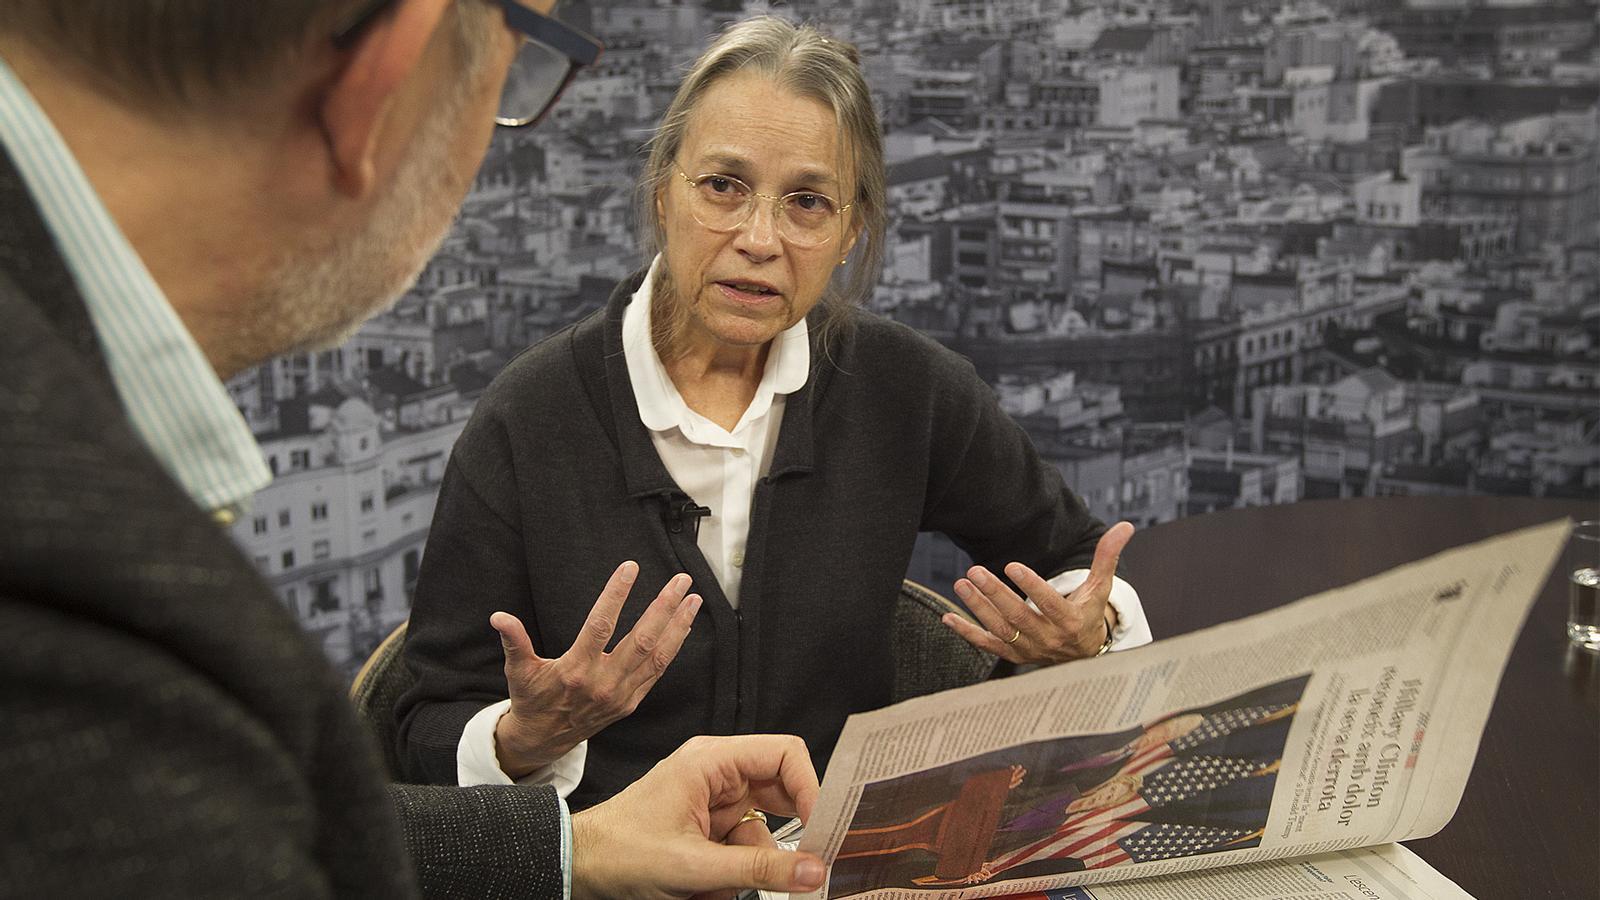 Entrevista d'Antoni Bassas a Susan DiGiacomo